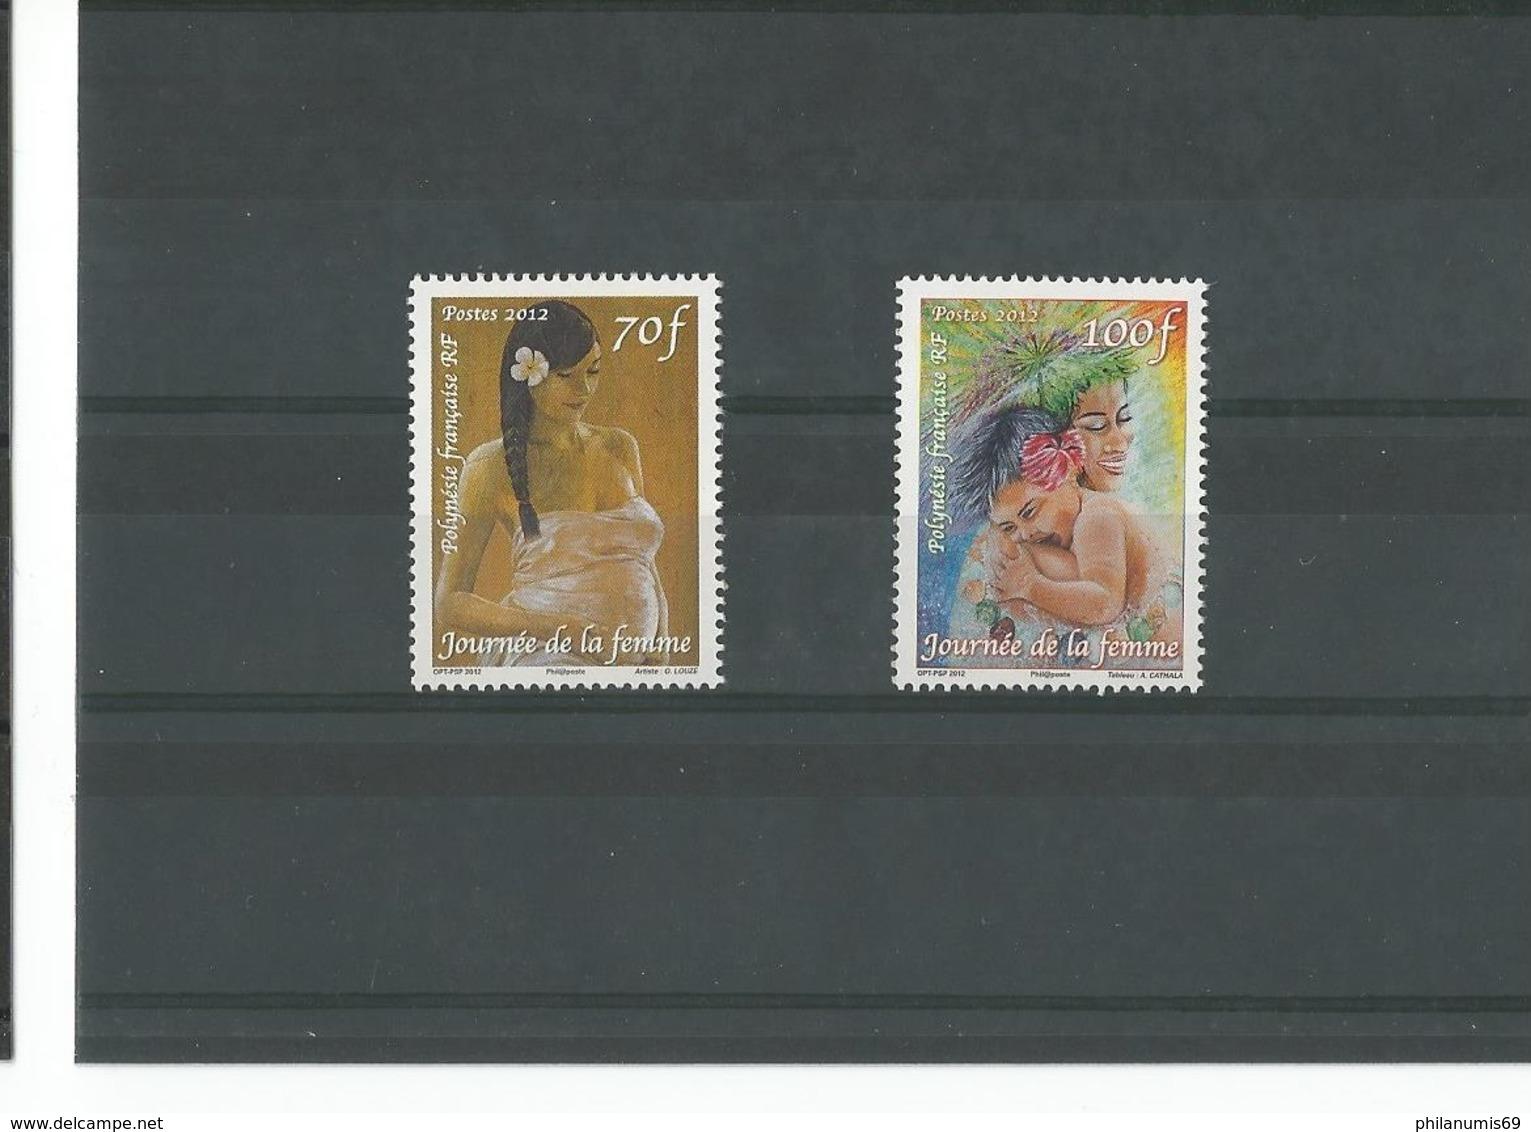 POLYNESIE 2012 - YT 982/983 - NEUF SANS CHARNIERE ** (MNH) GOMME D'ORIGINE LUXE - Polynésie Française